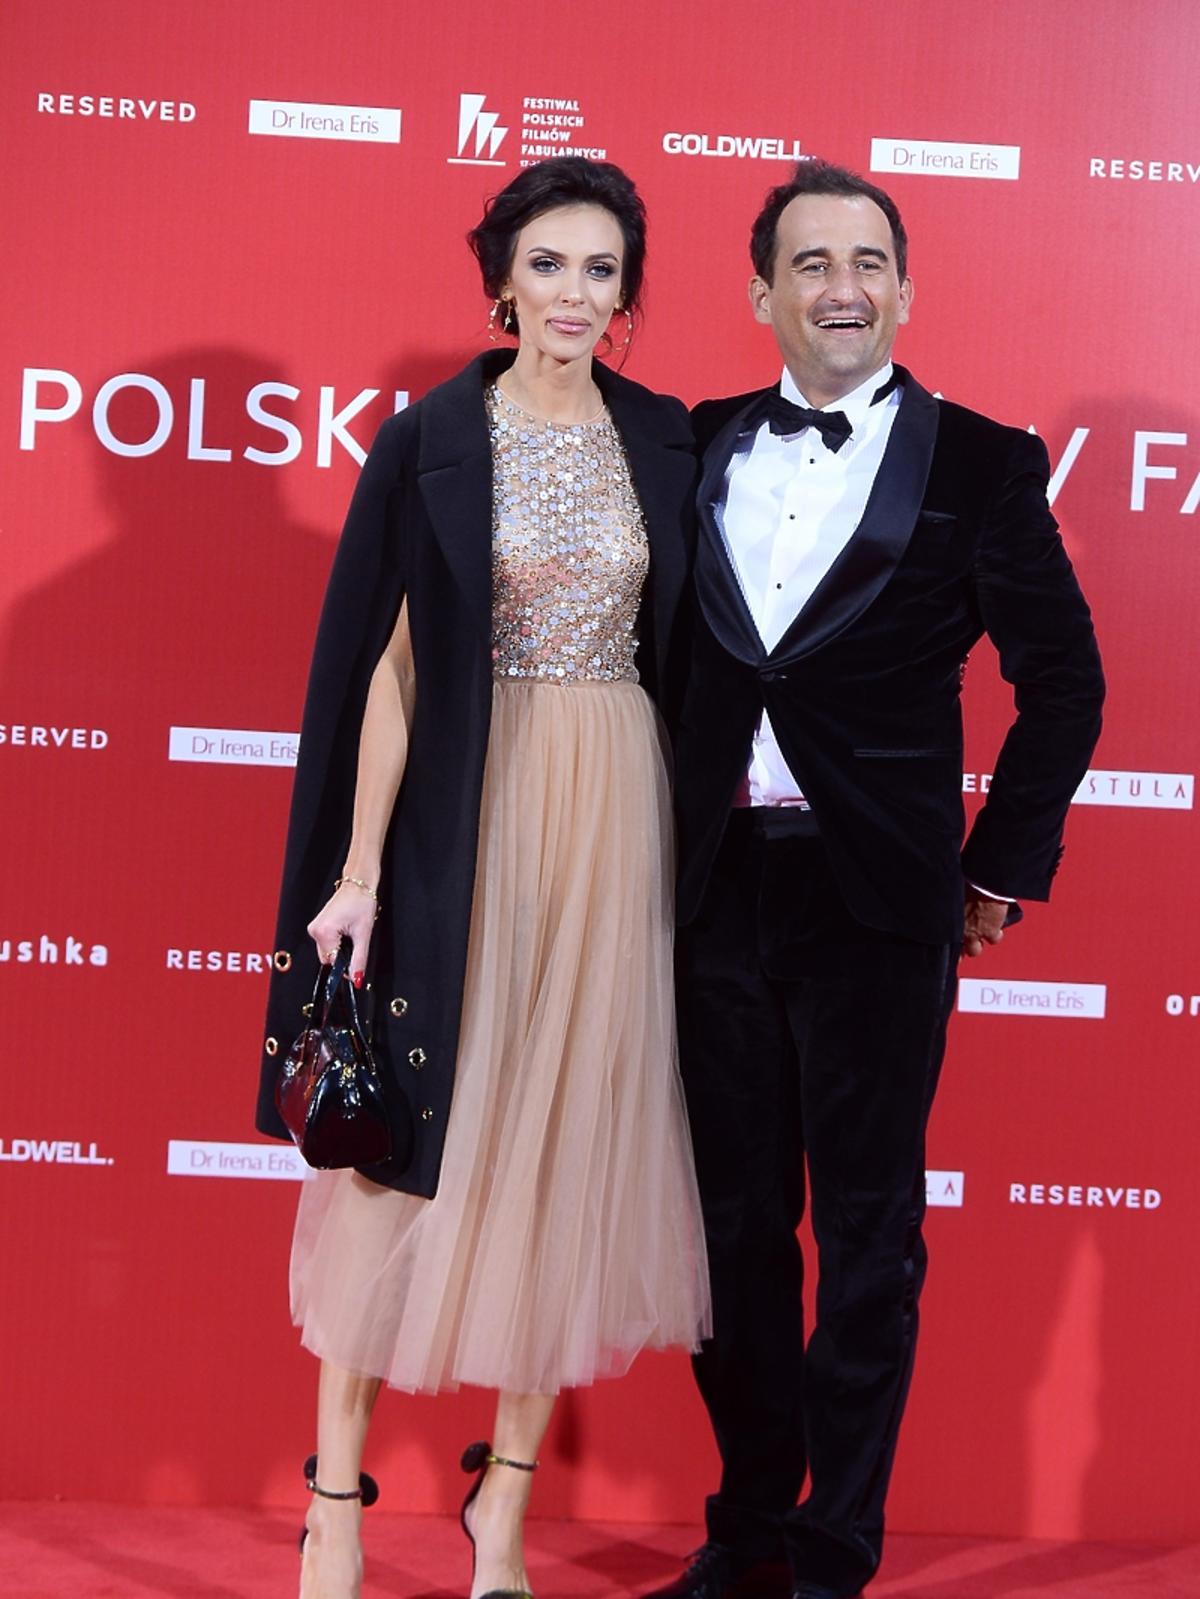 Marcelina Leszczak, Michał Koterski